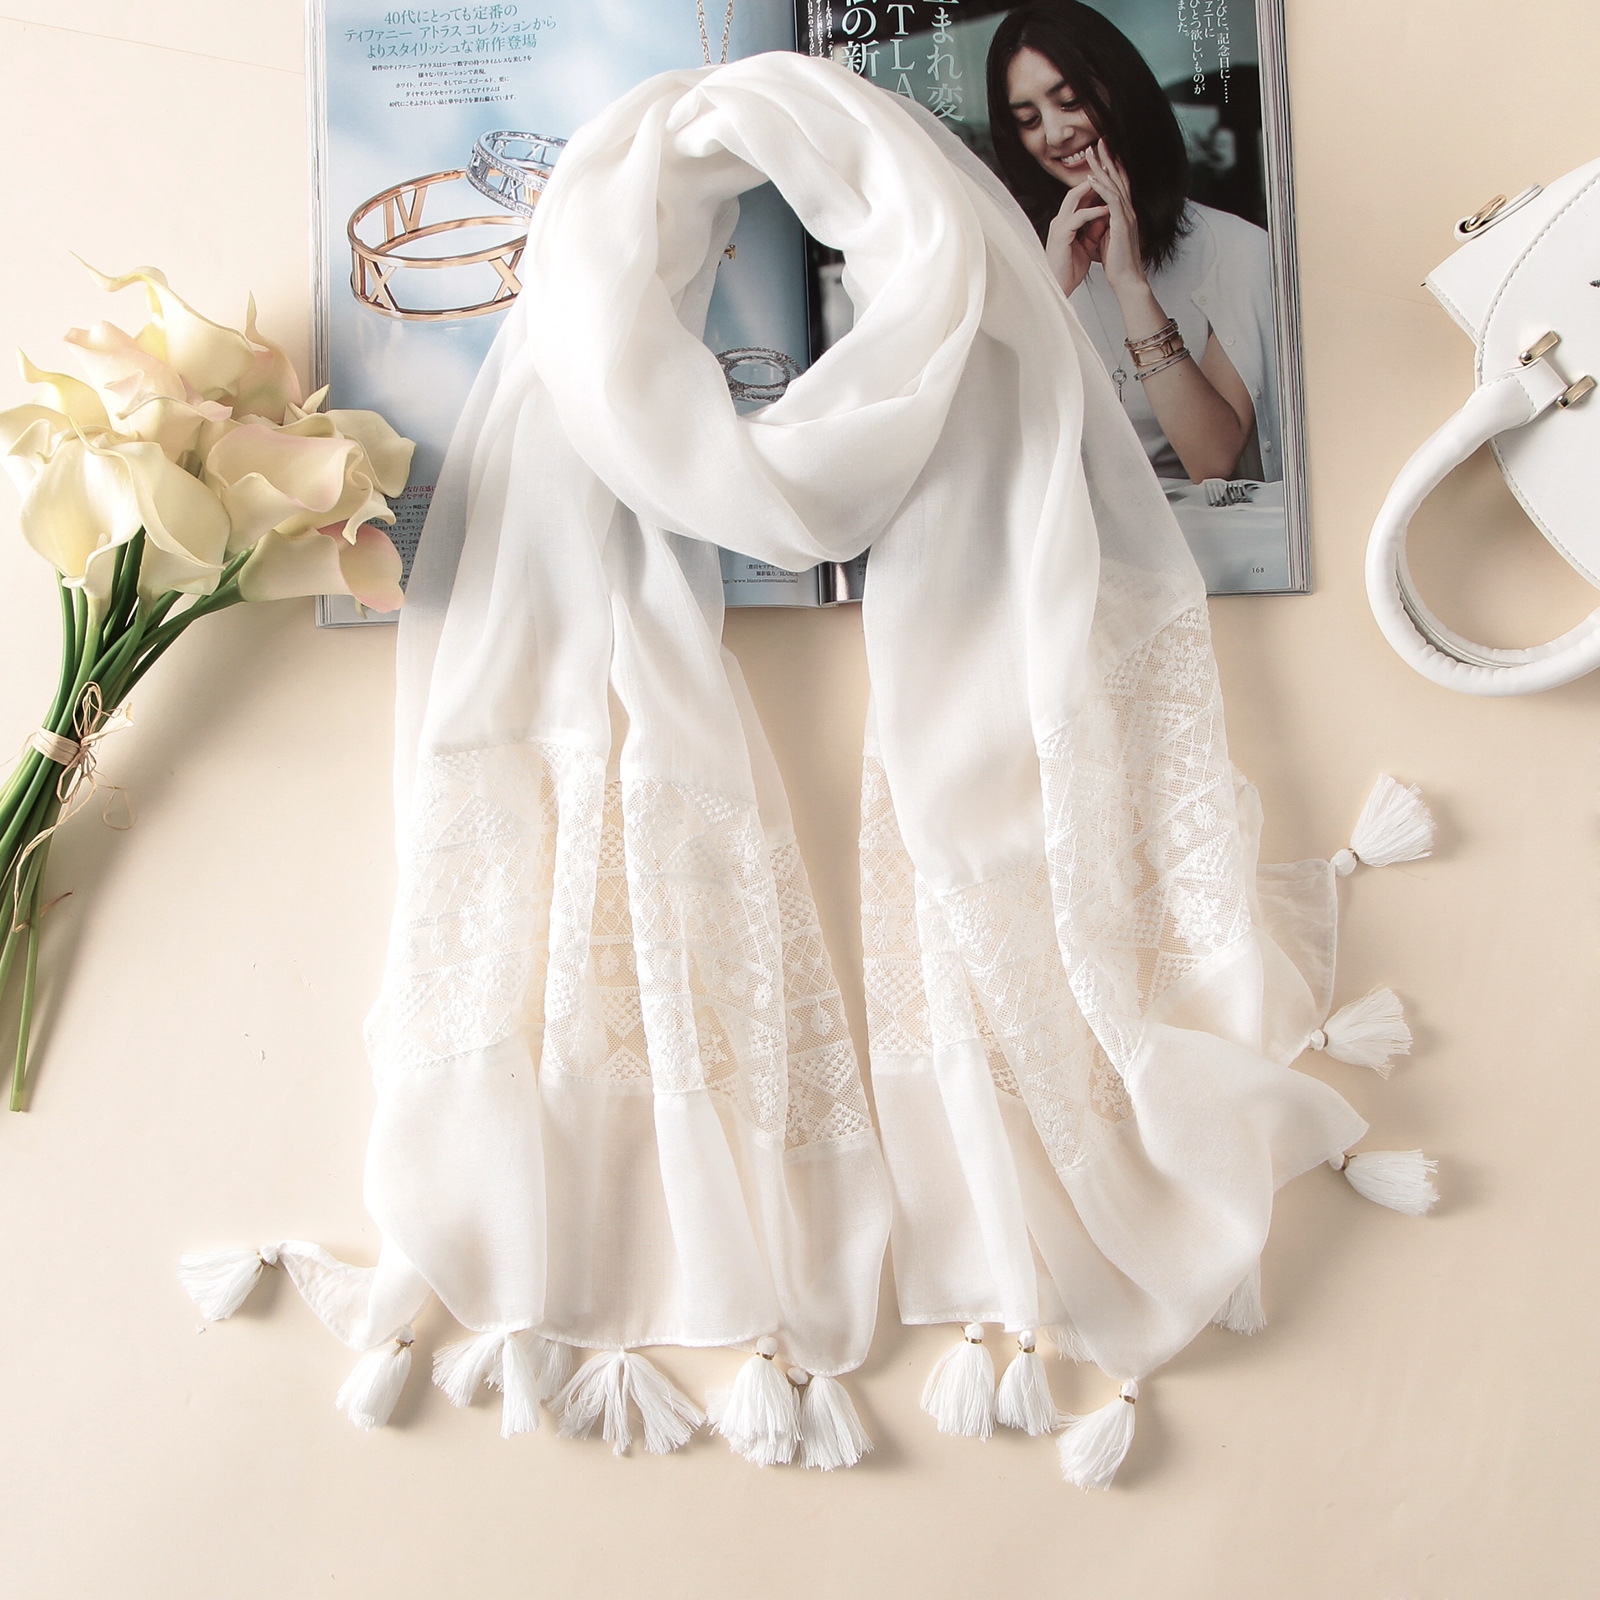 Brand 2020 Spring Summer Women Scarf Fashion White Lace Silk Scarves Shawls Pashmina Bandana Female Foulard Pareo Beach